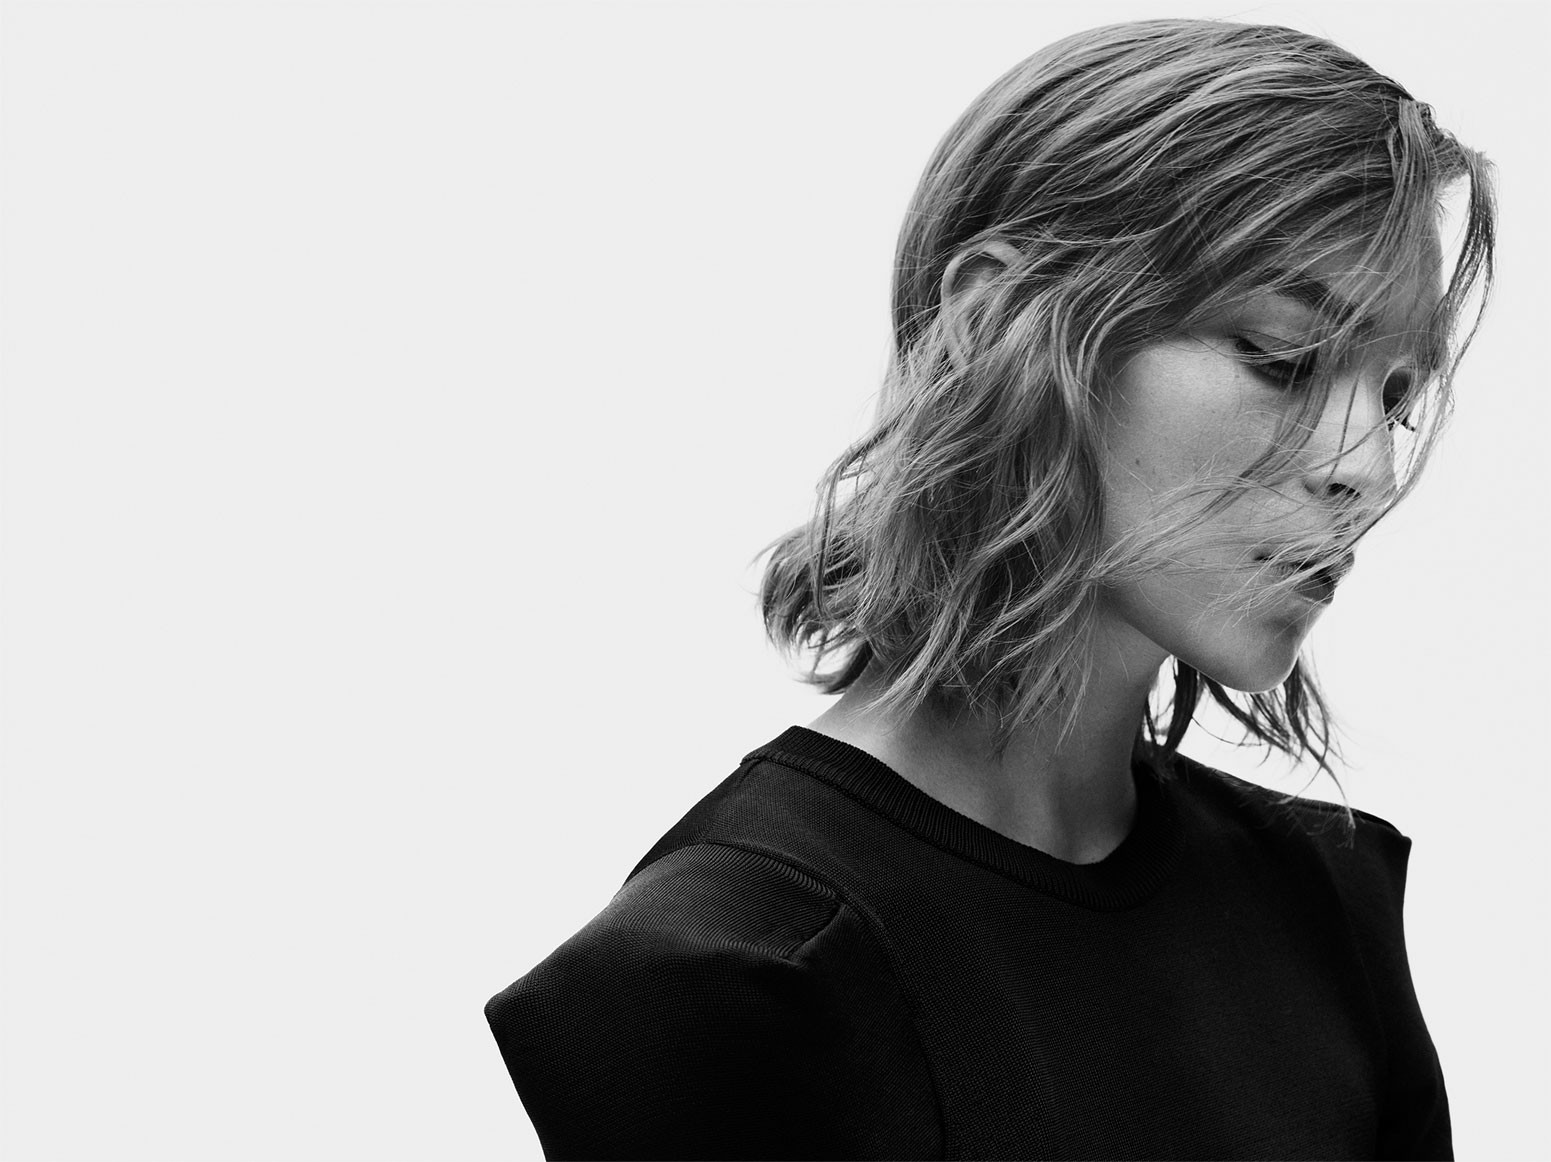 Foto de Zara editorial knit 2017 (11/11)